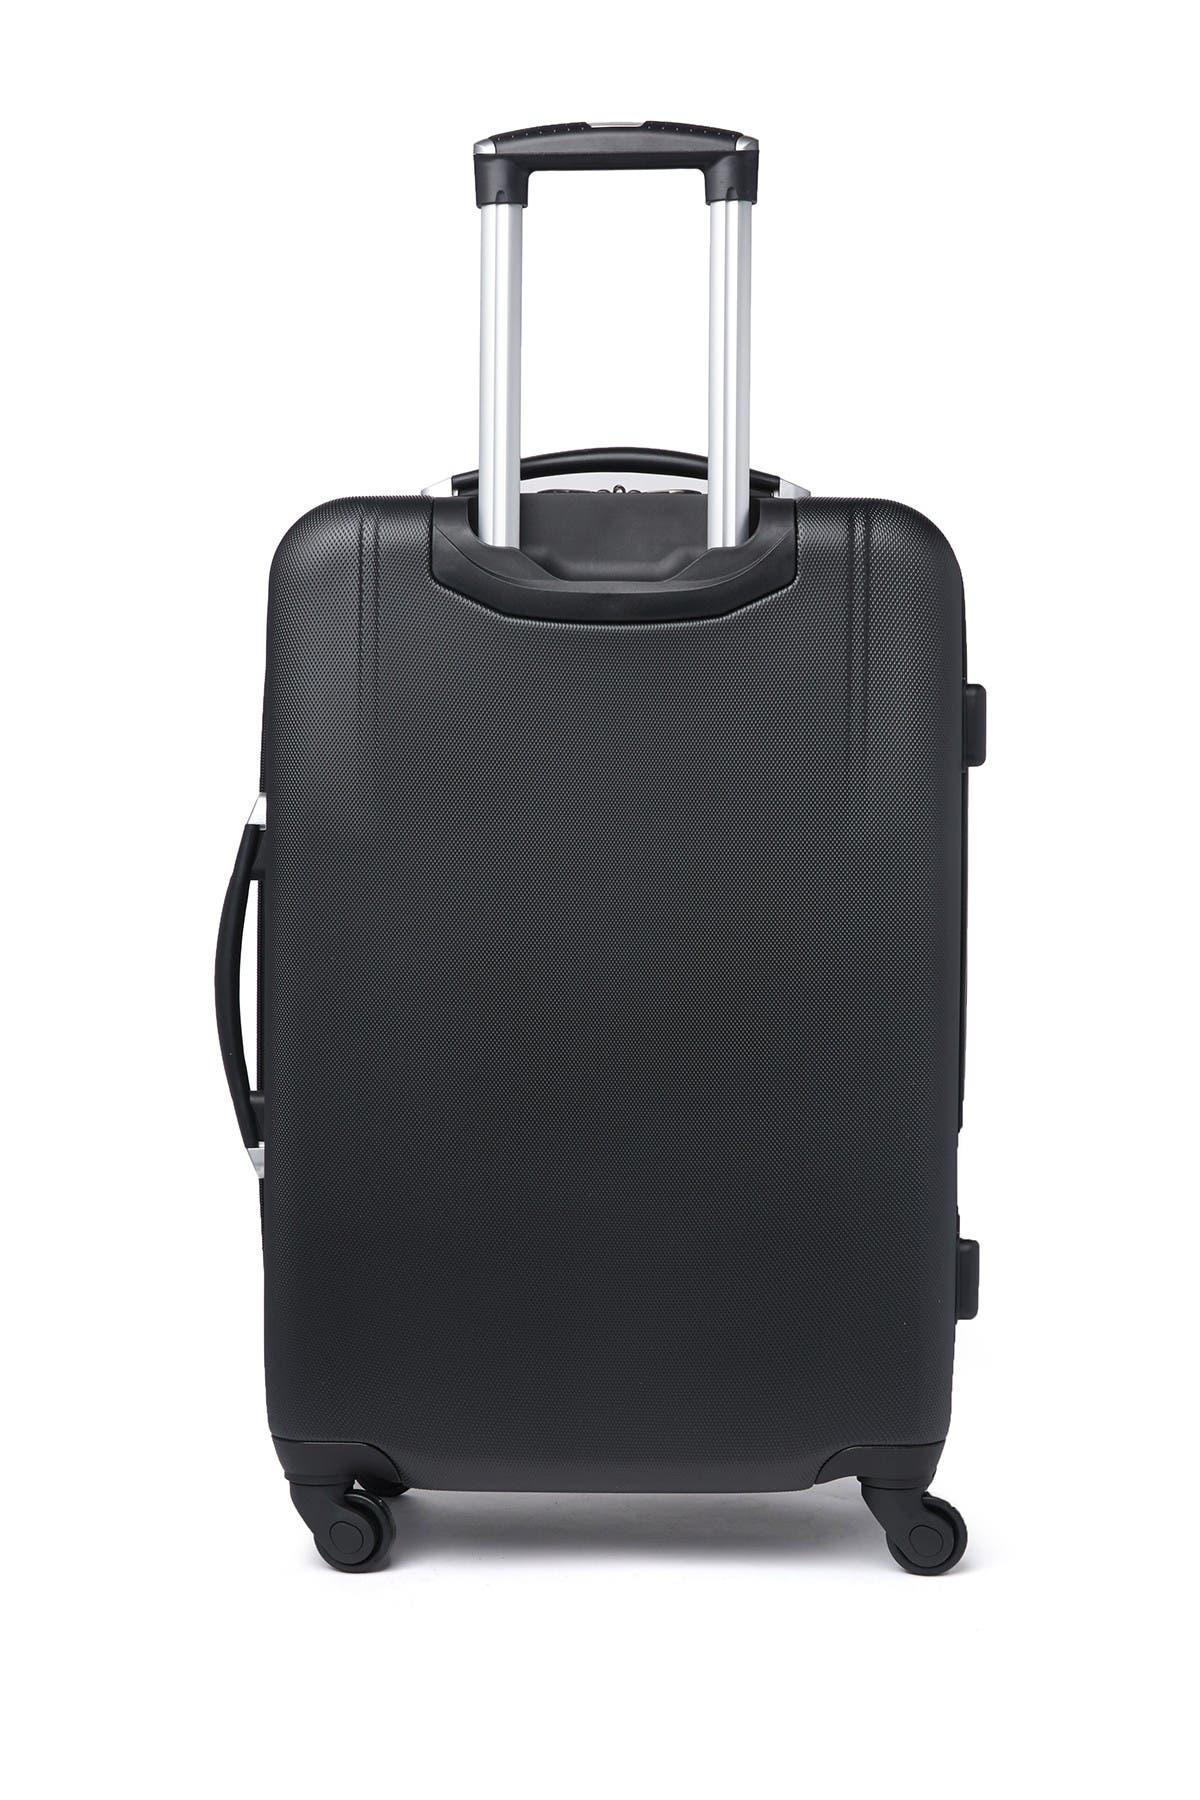 "Image of Samsonite Geo Hardshell 24"" Spinner Luggage"